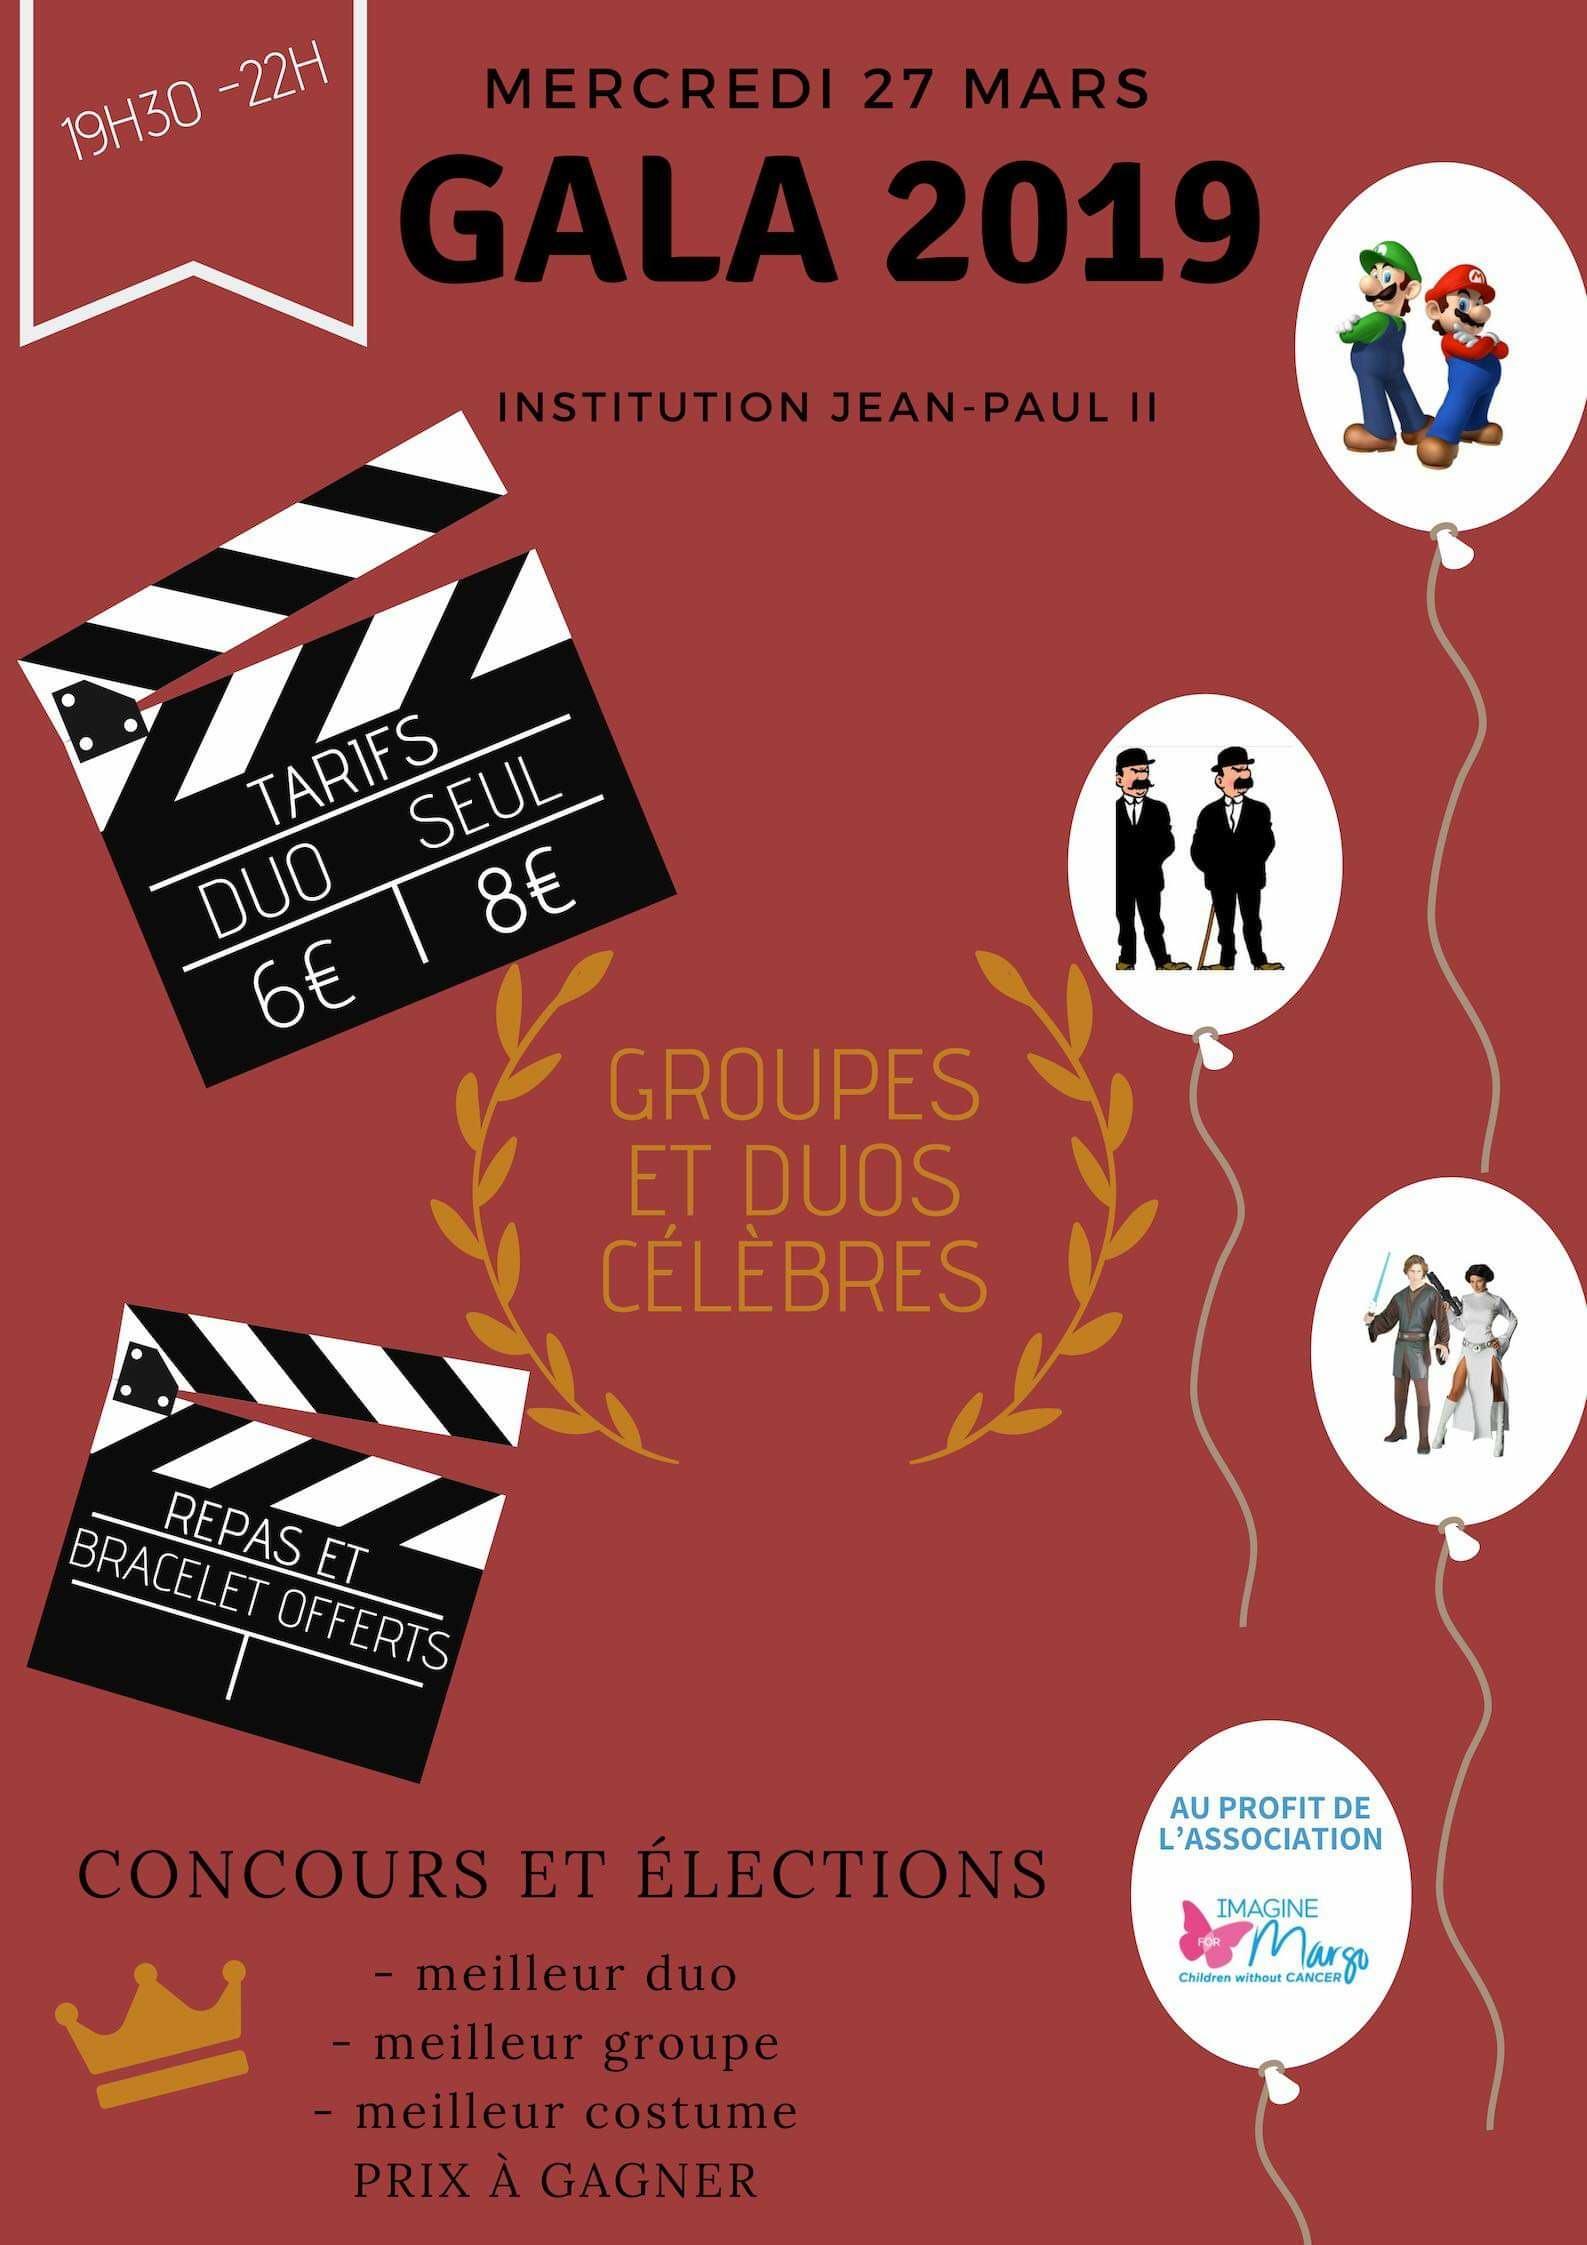 gala institution jean paul II rouen au profit d'Imagine for Margo